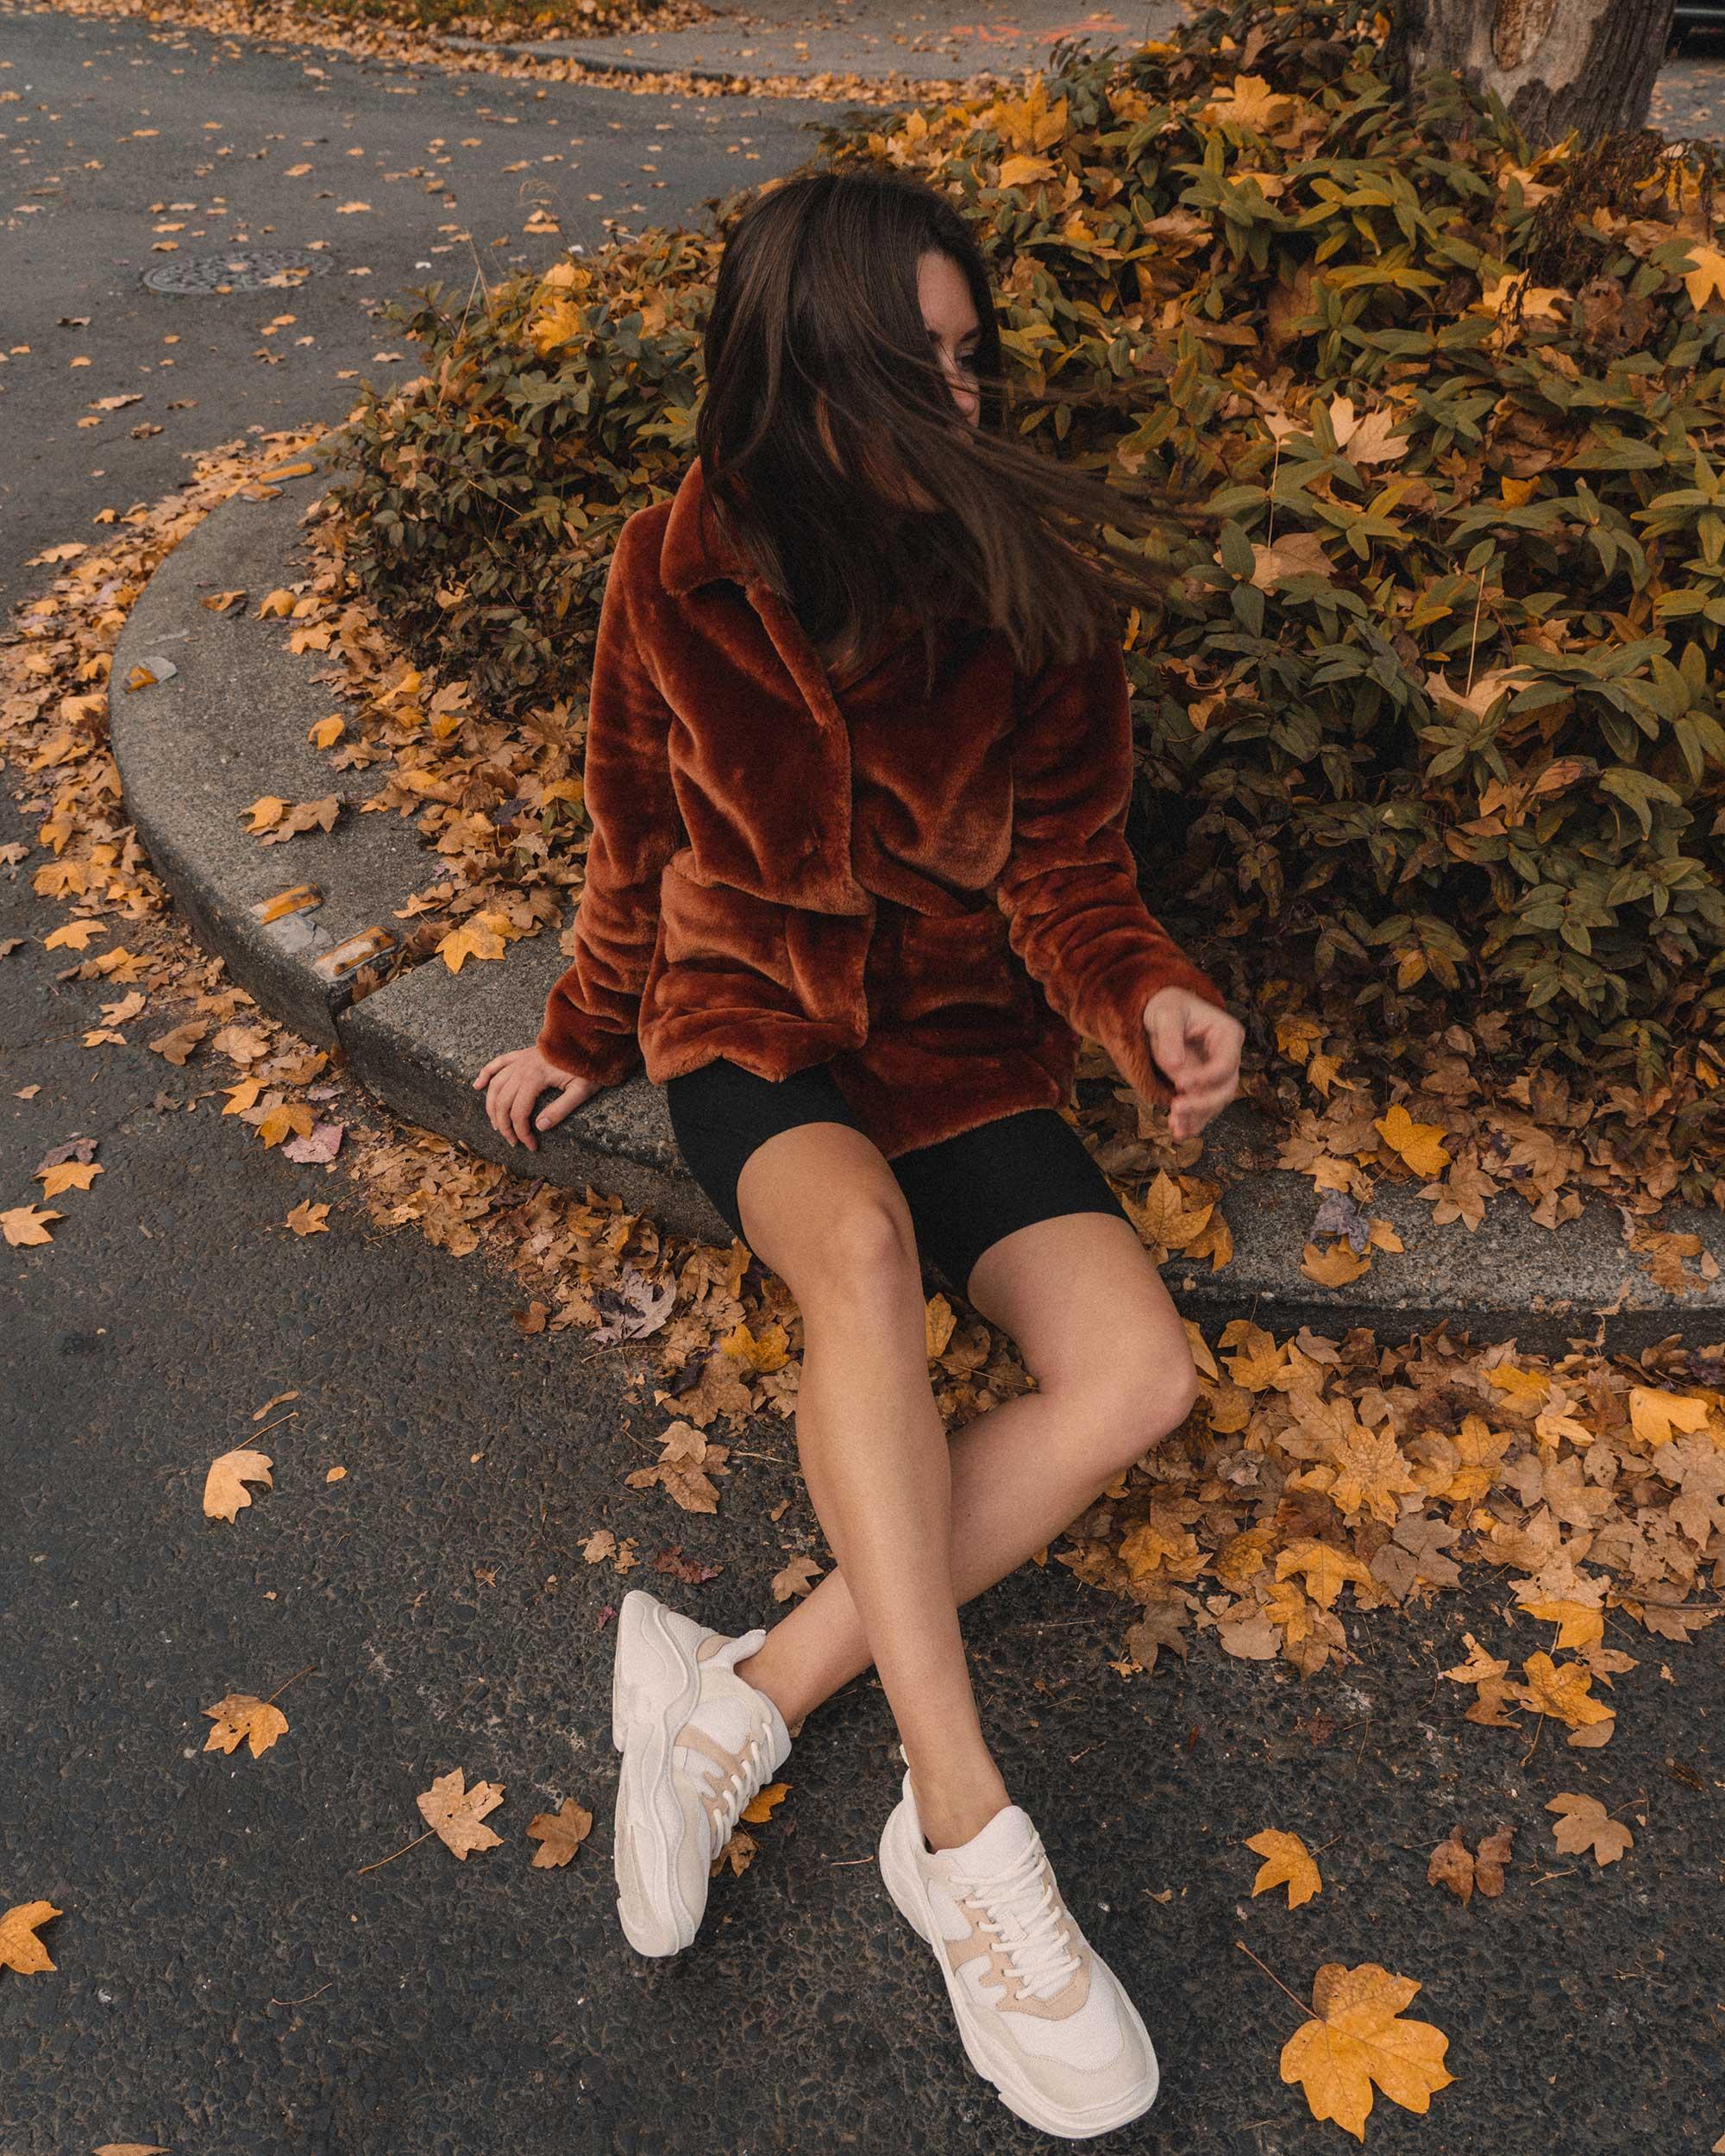 Rebecca Taylor FAUX FUR COAT in rust, fall outfit, Schutz Shoes Jackye Chunky Sneaker1.jpg